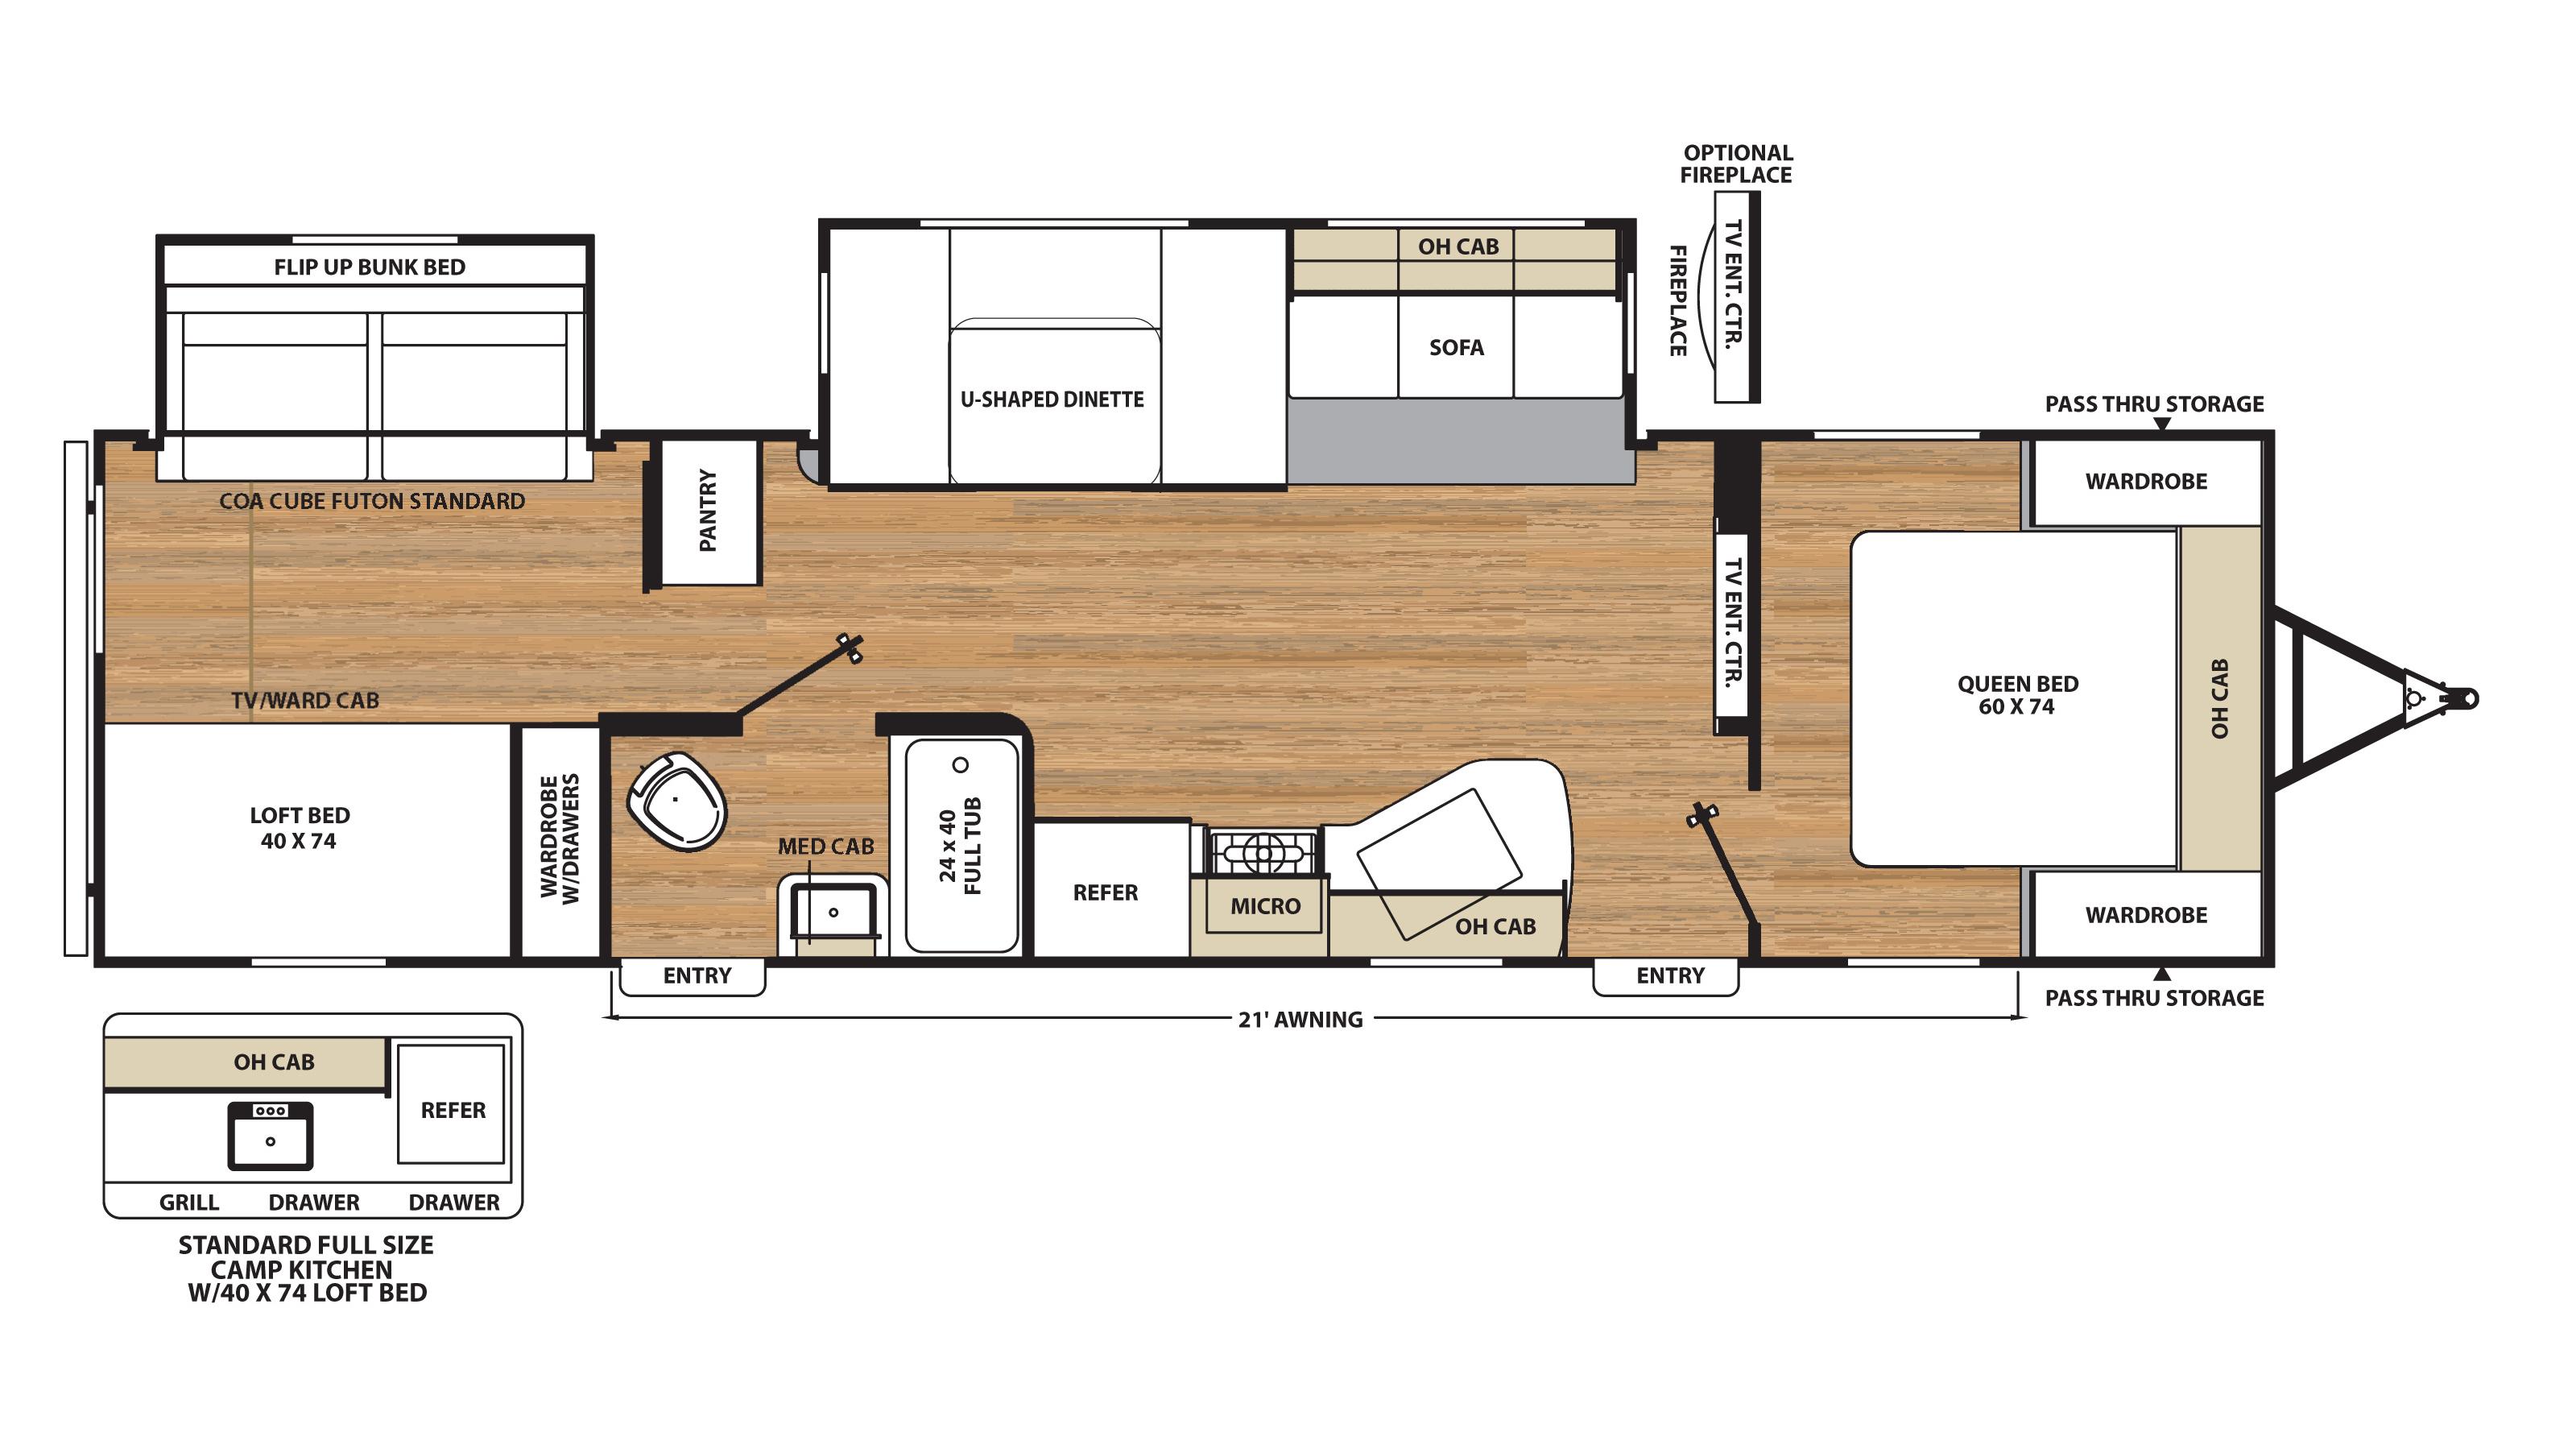 Coachman Travel Trailer Floor Plans New 2018 Catalina Legacy Edition 323bhds Coachman